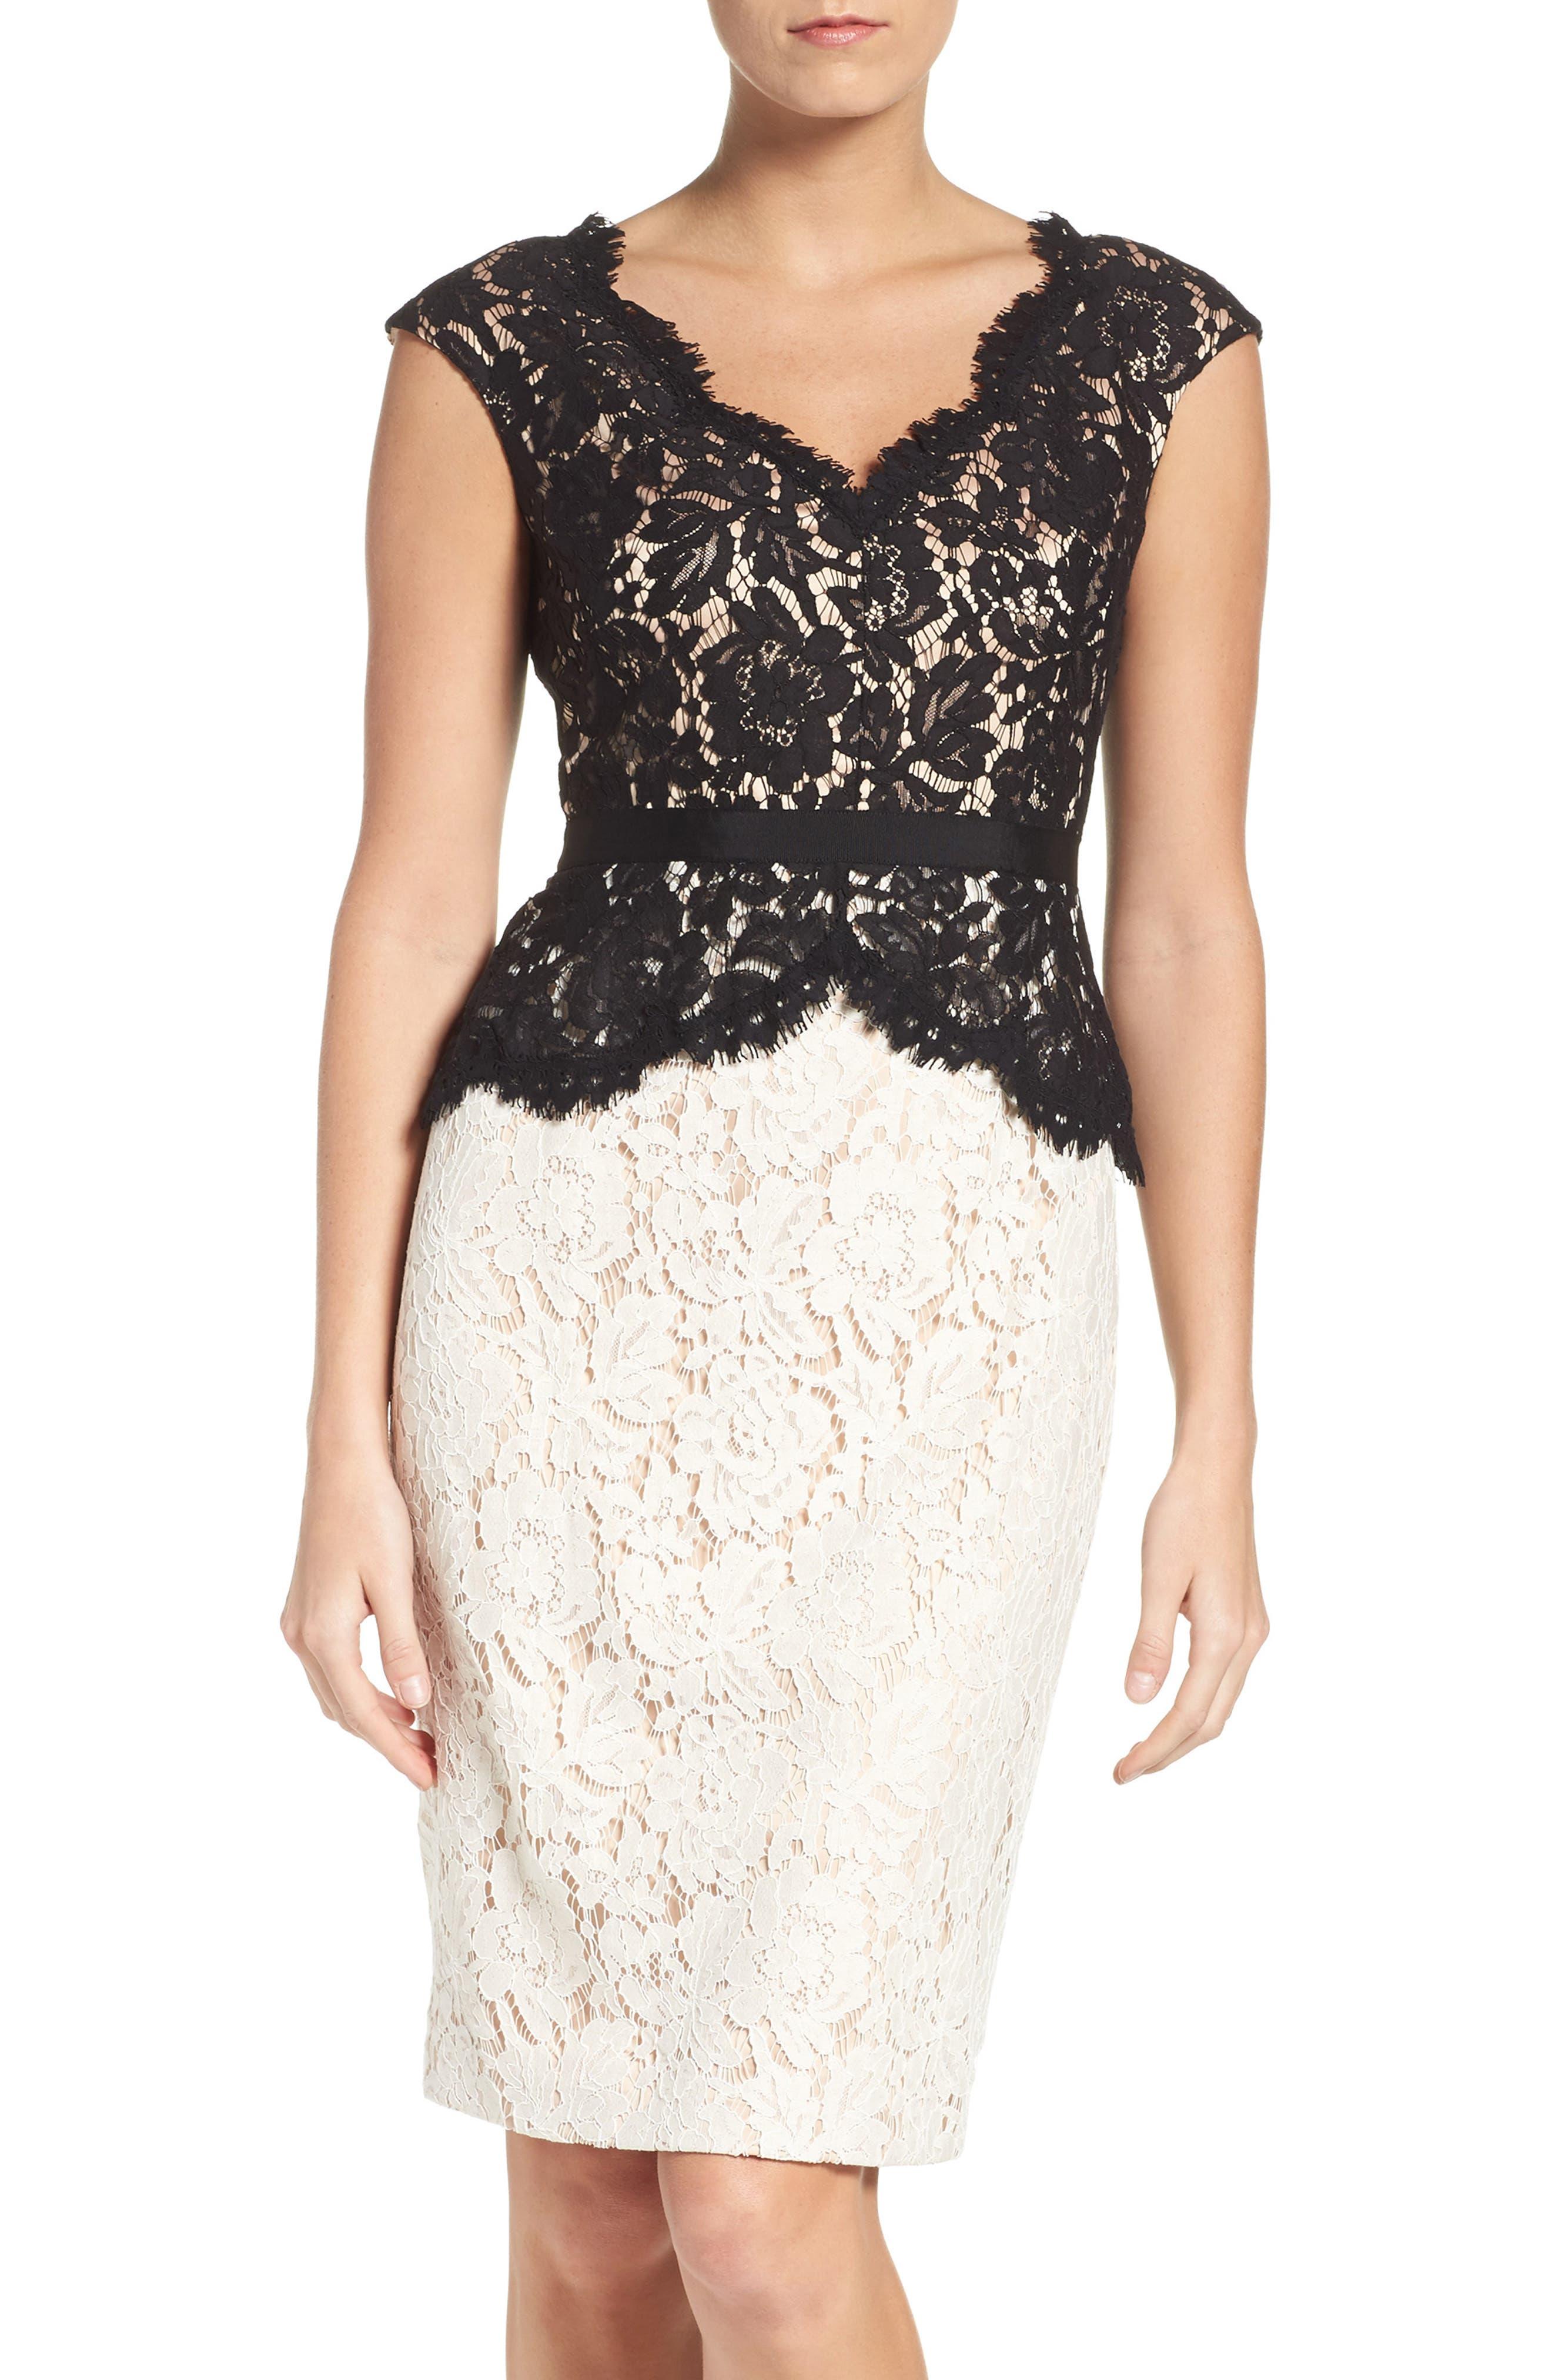 Alternate Image 1 Selected - Eliza J Lace Sheath Dress